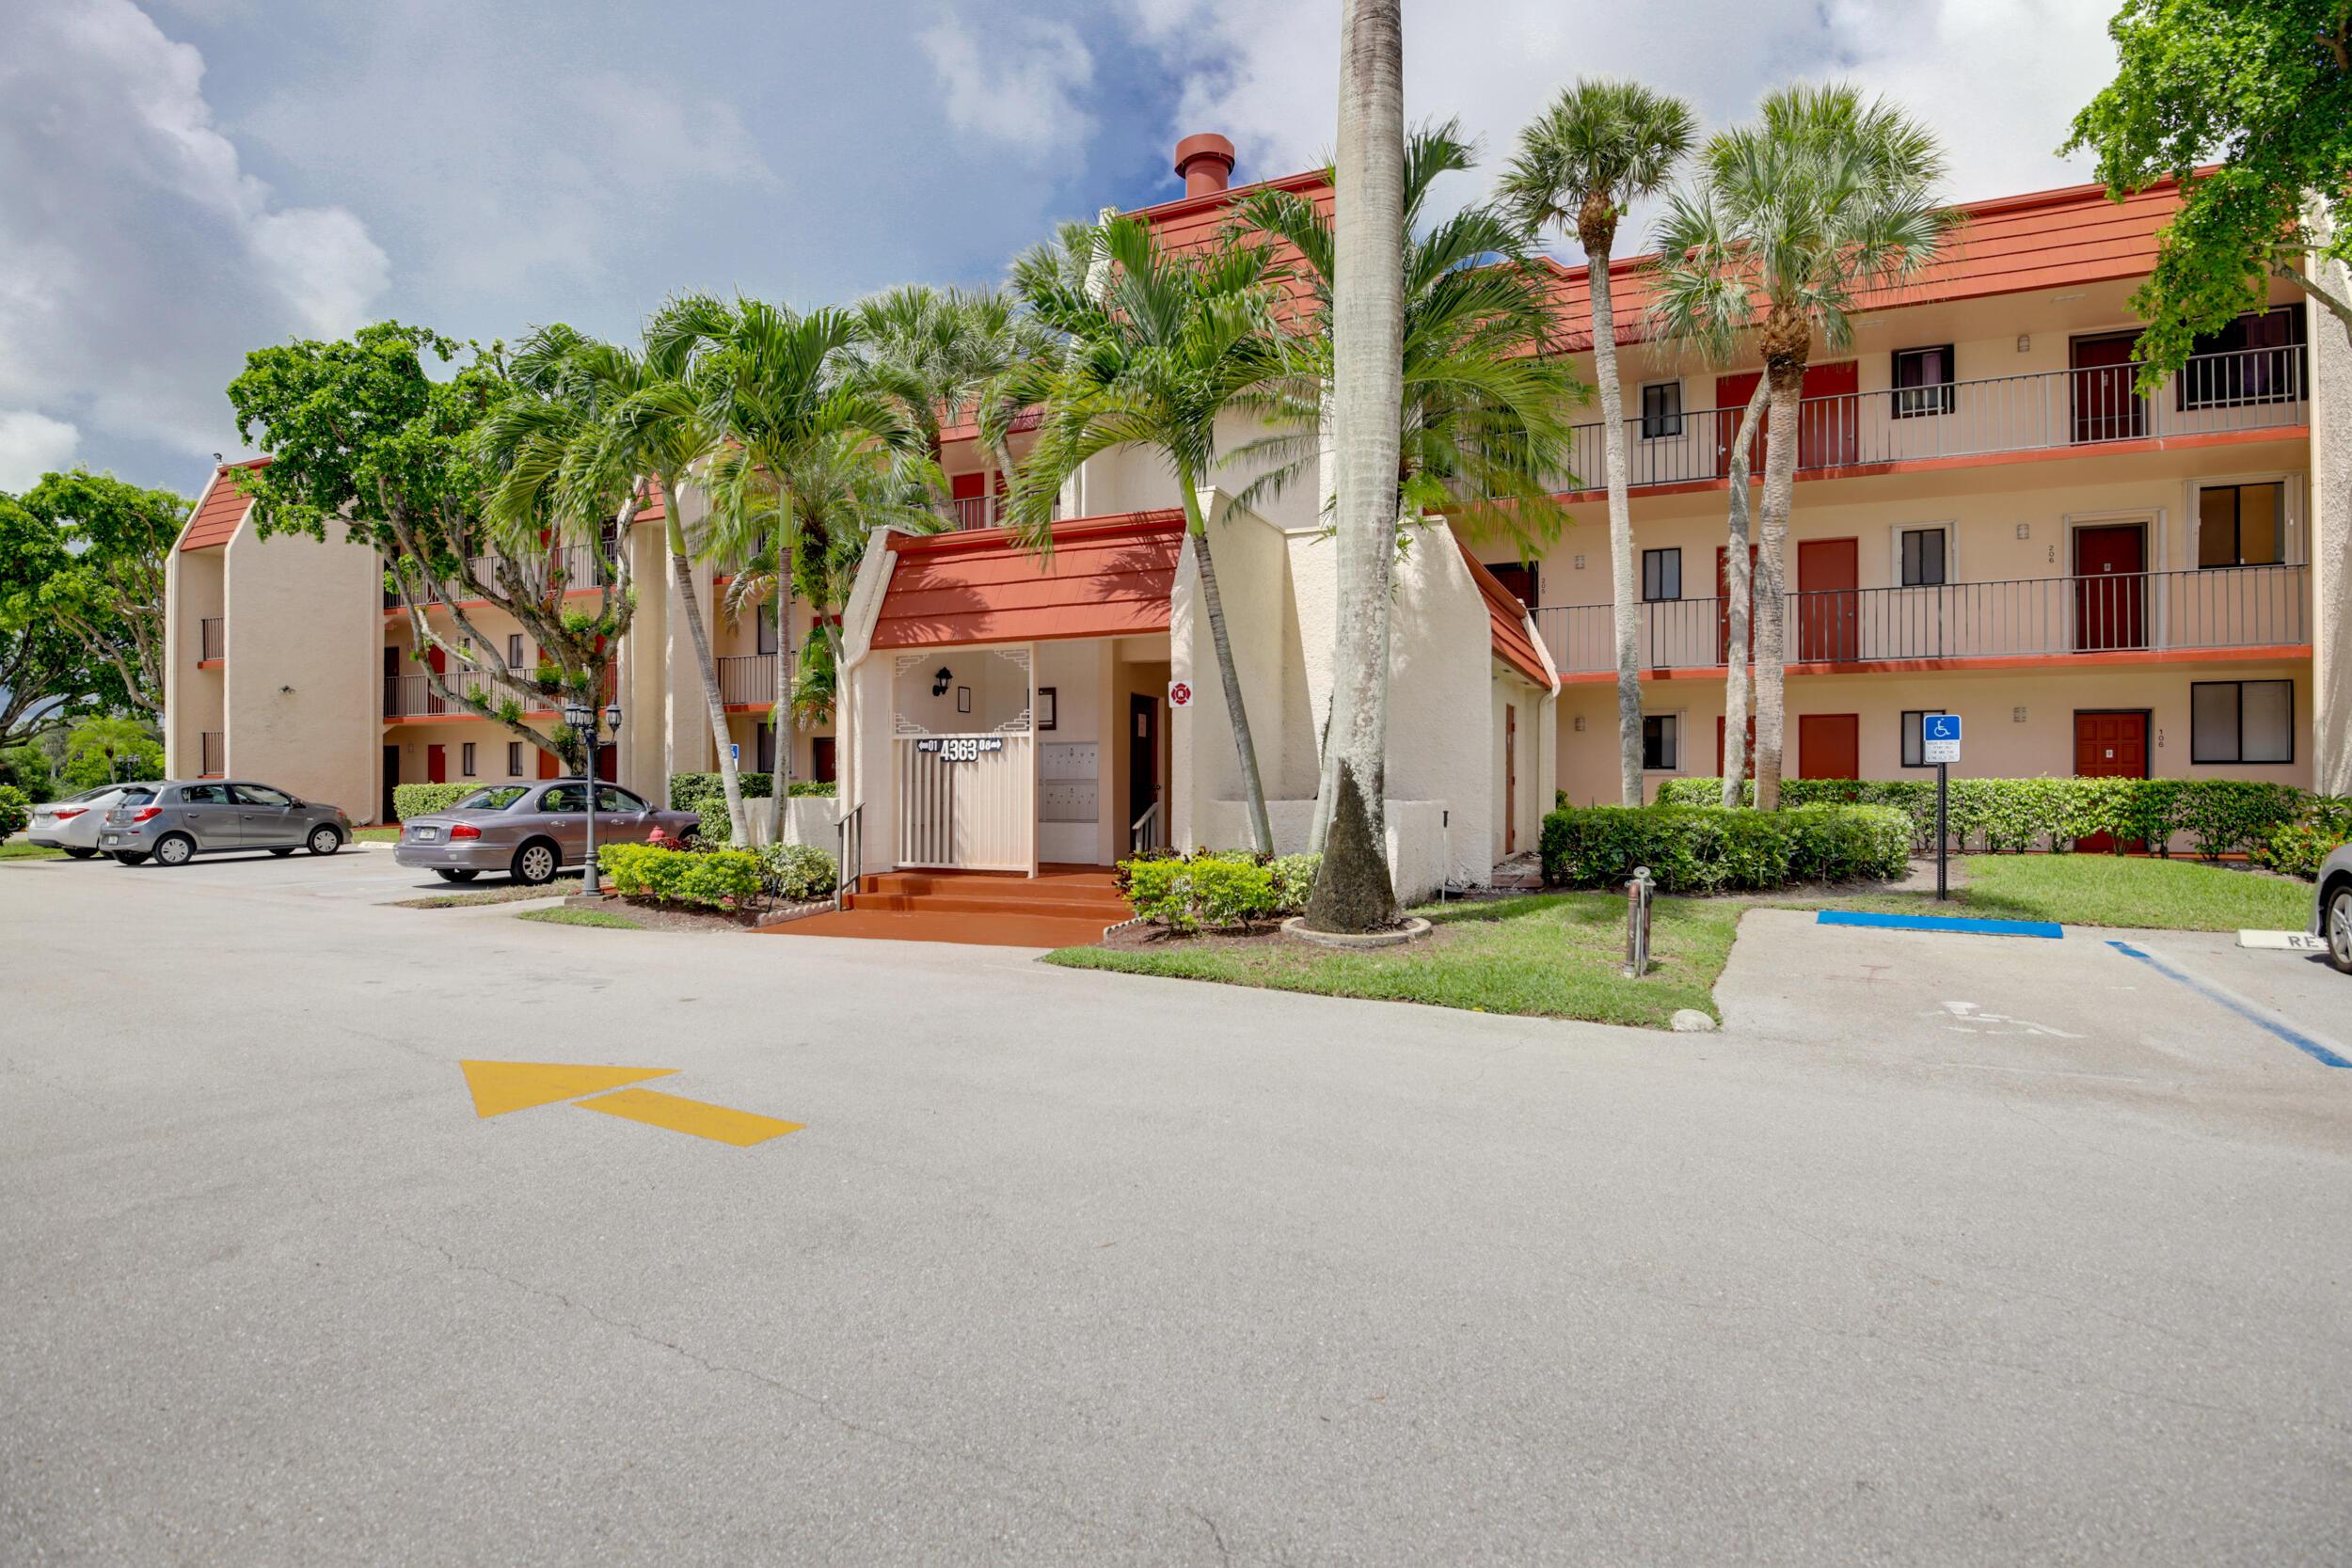 4363  Trevi Court 104 For Sale 10719430, FL